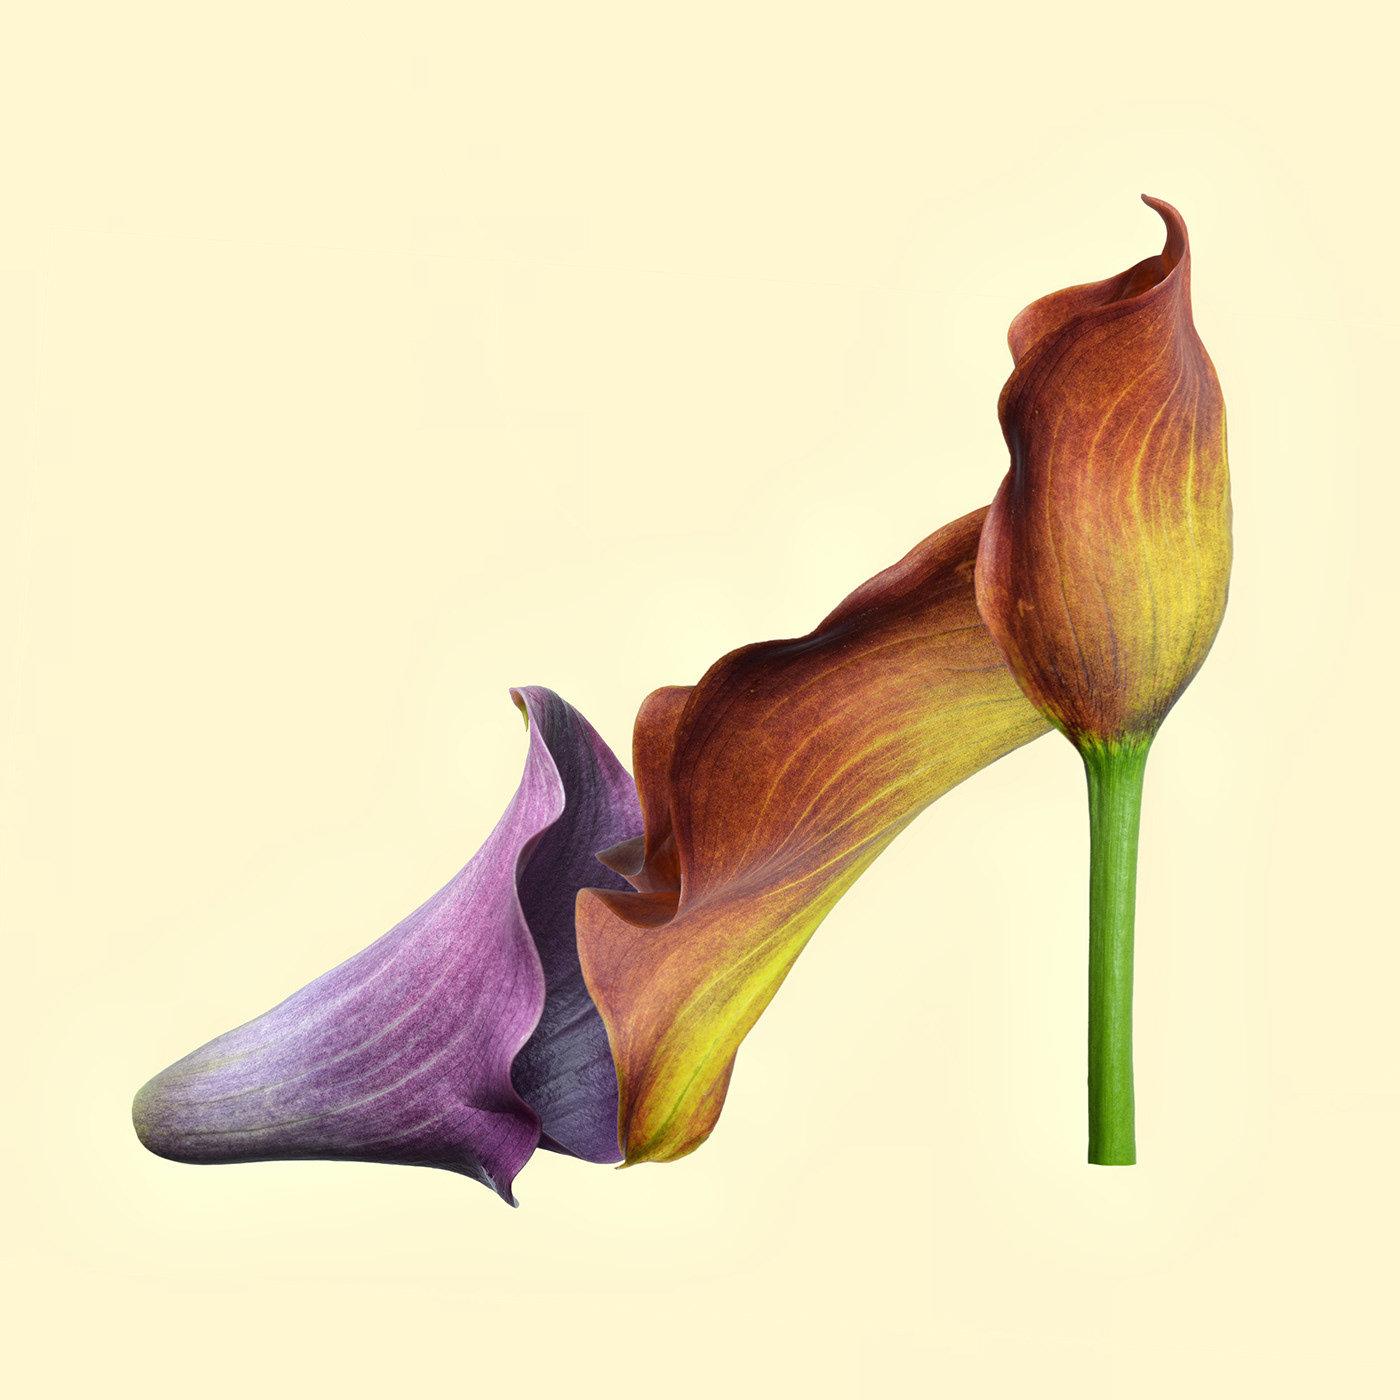 Flower Heels / фото Bettina Güber